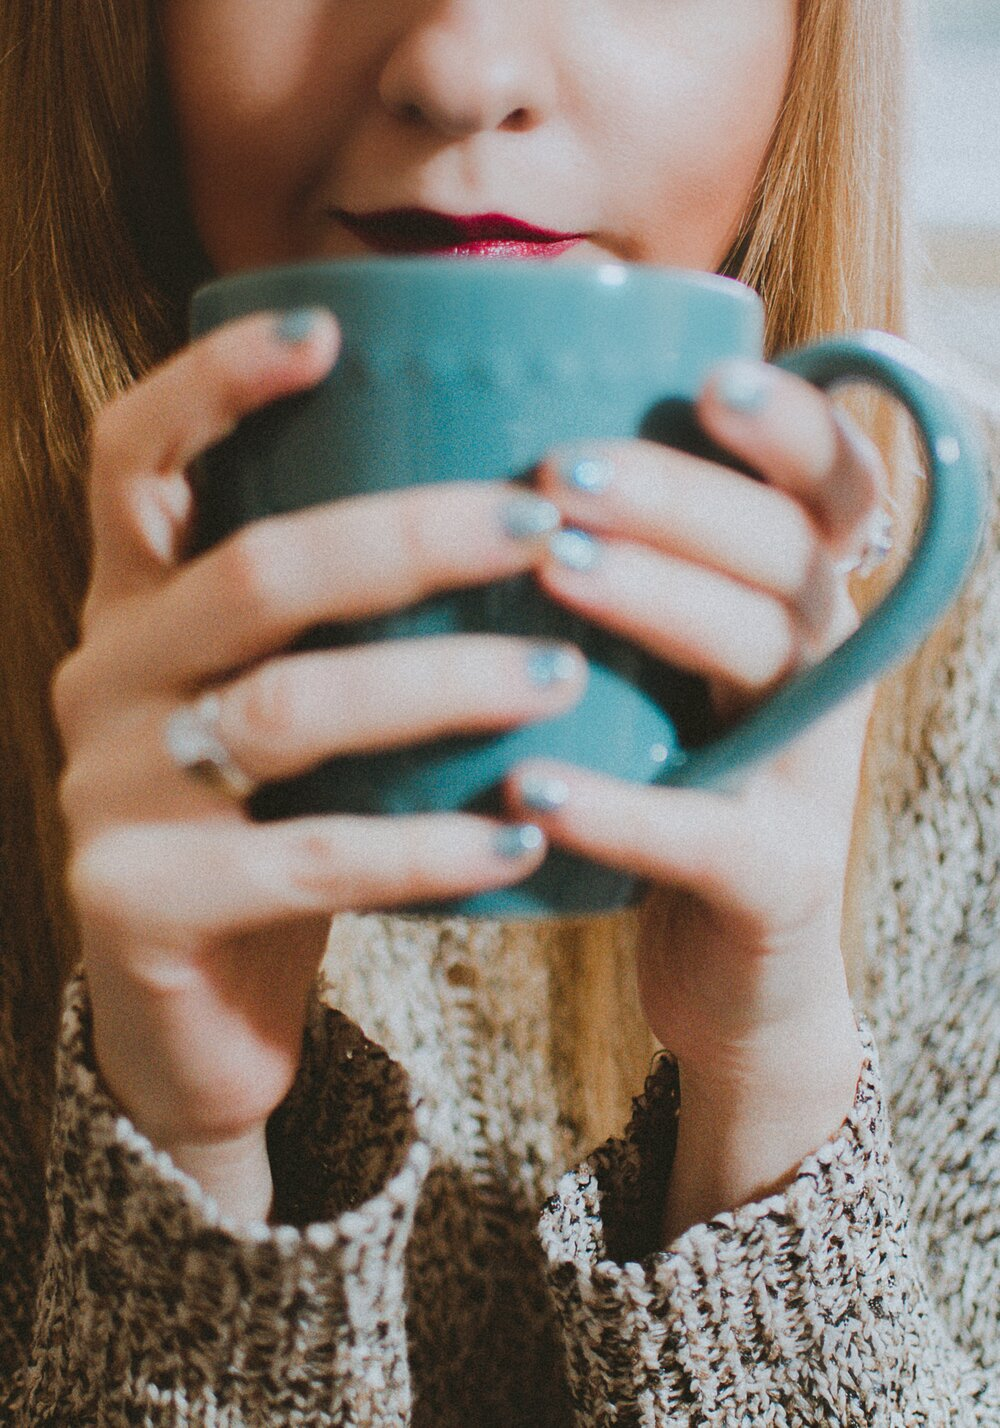 uwm.tcm.gold.tinctures.woman-holding-blue-ceramic-mug-1834083.jpg